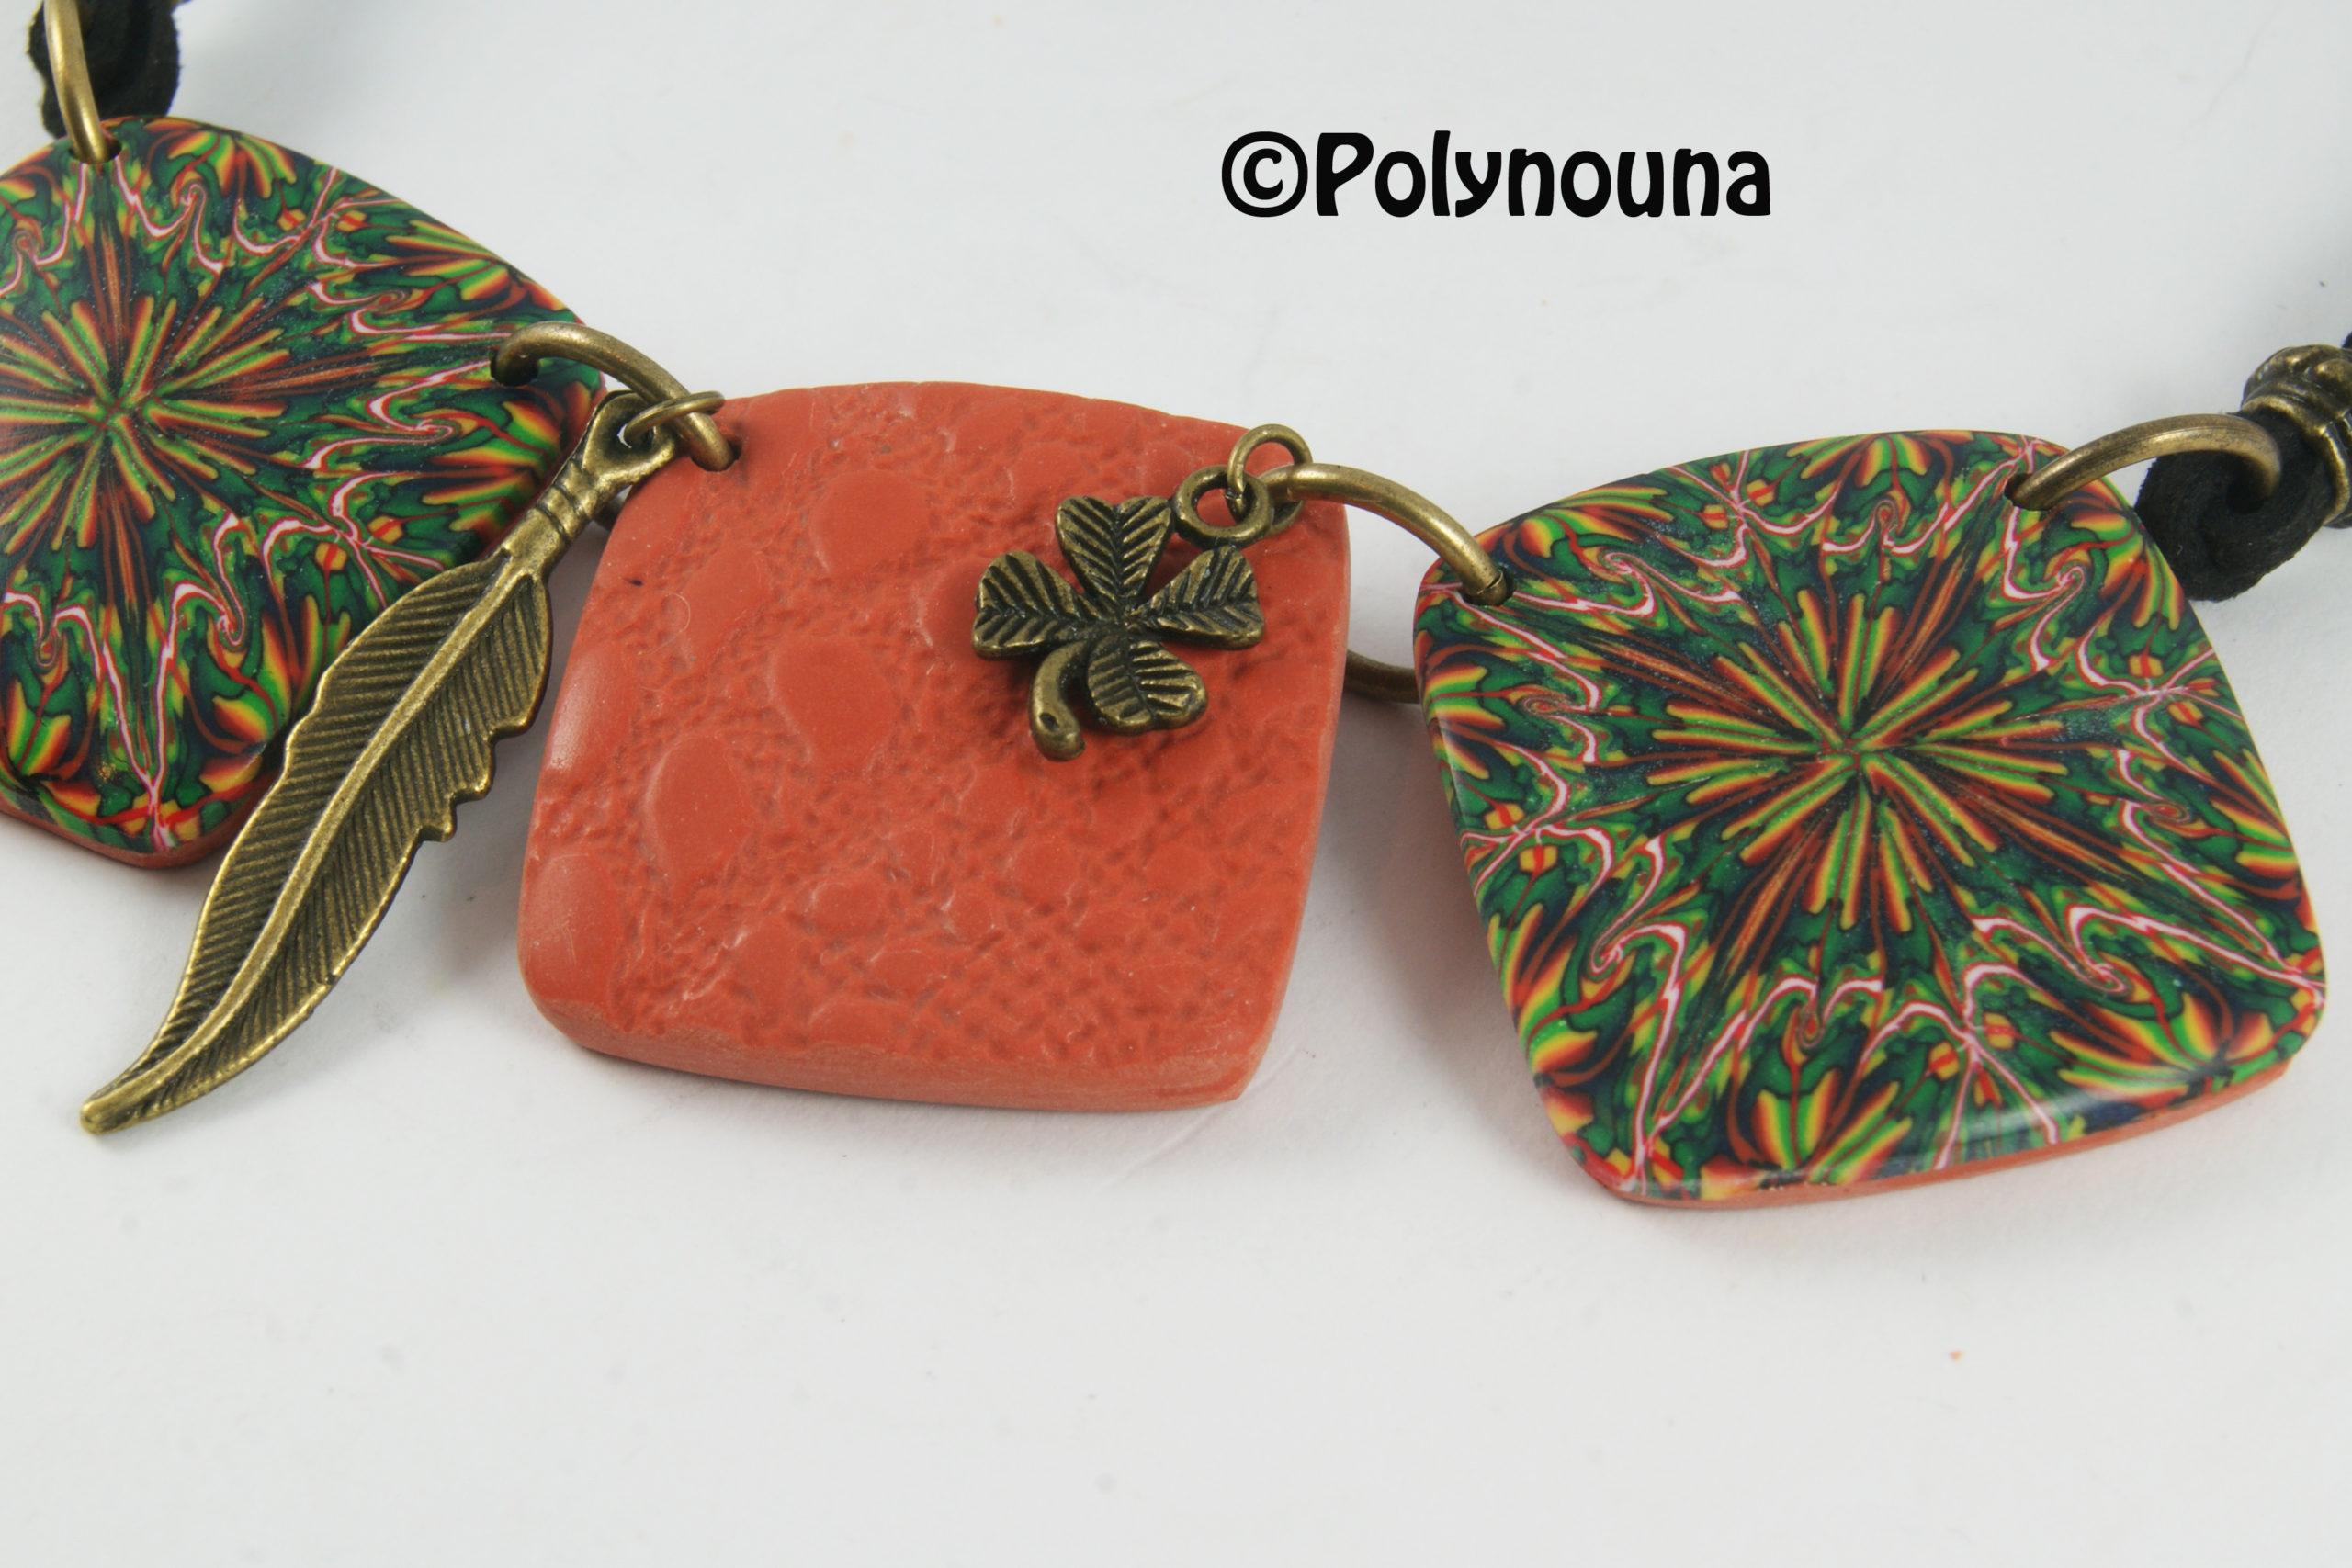 Atelier Polynouna